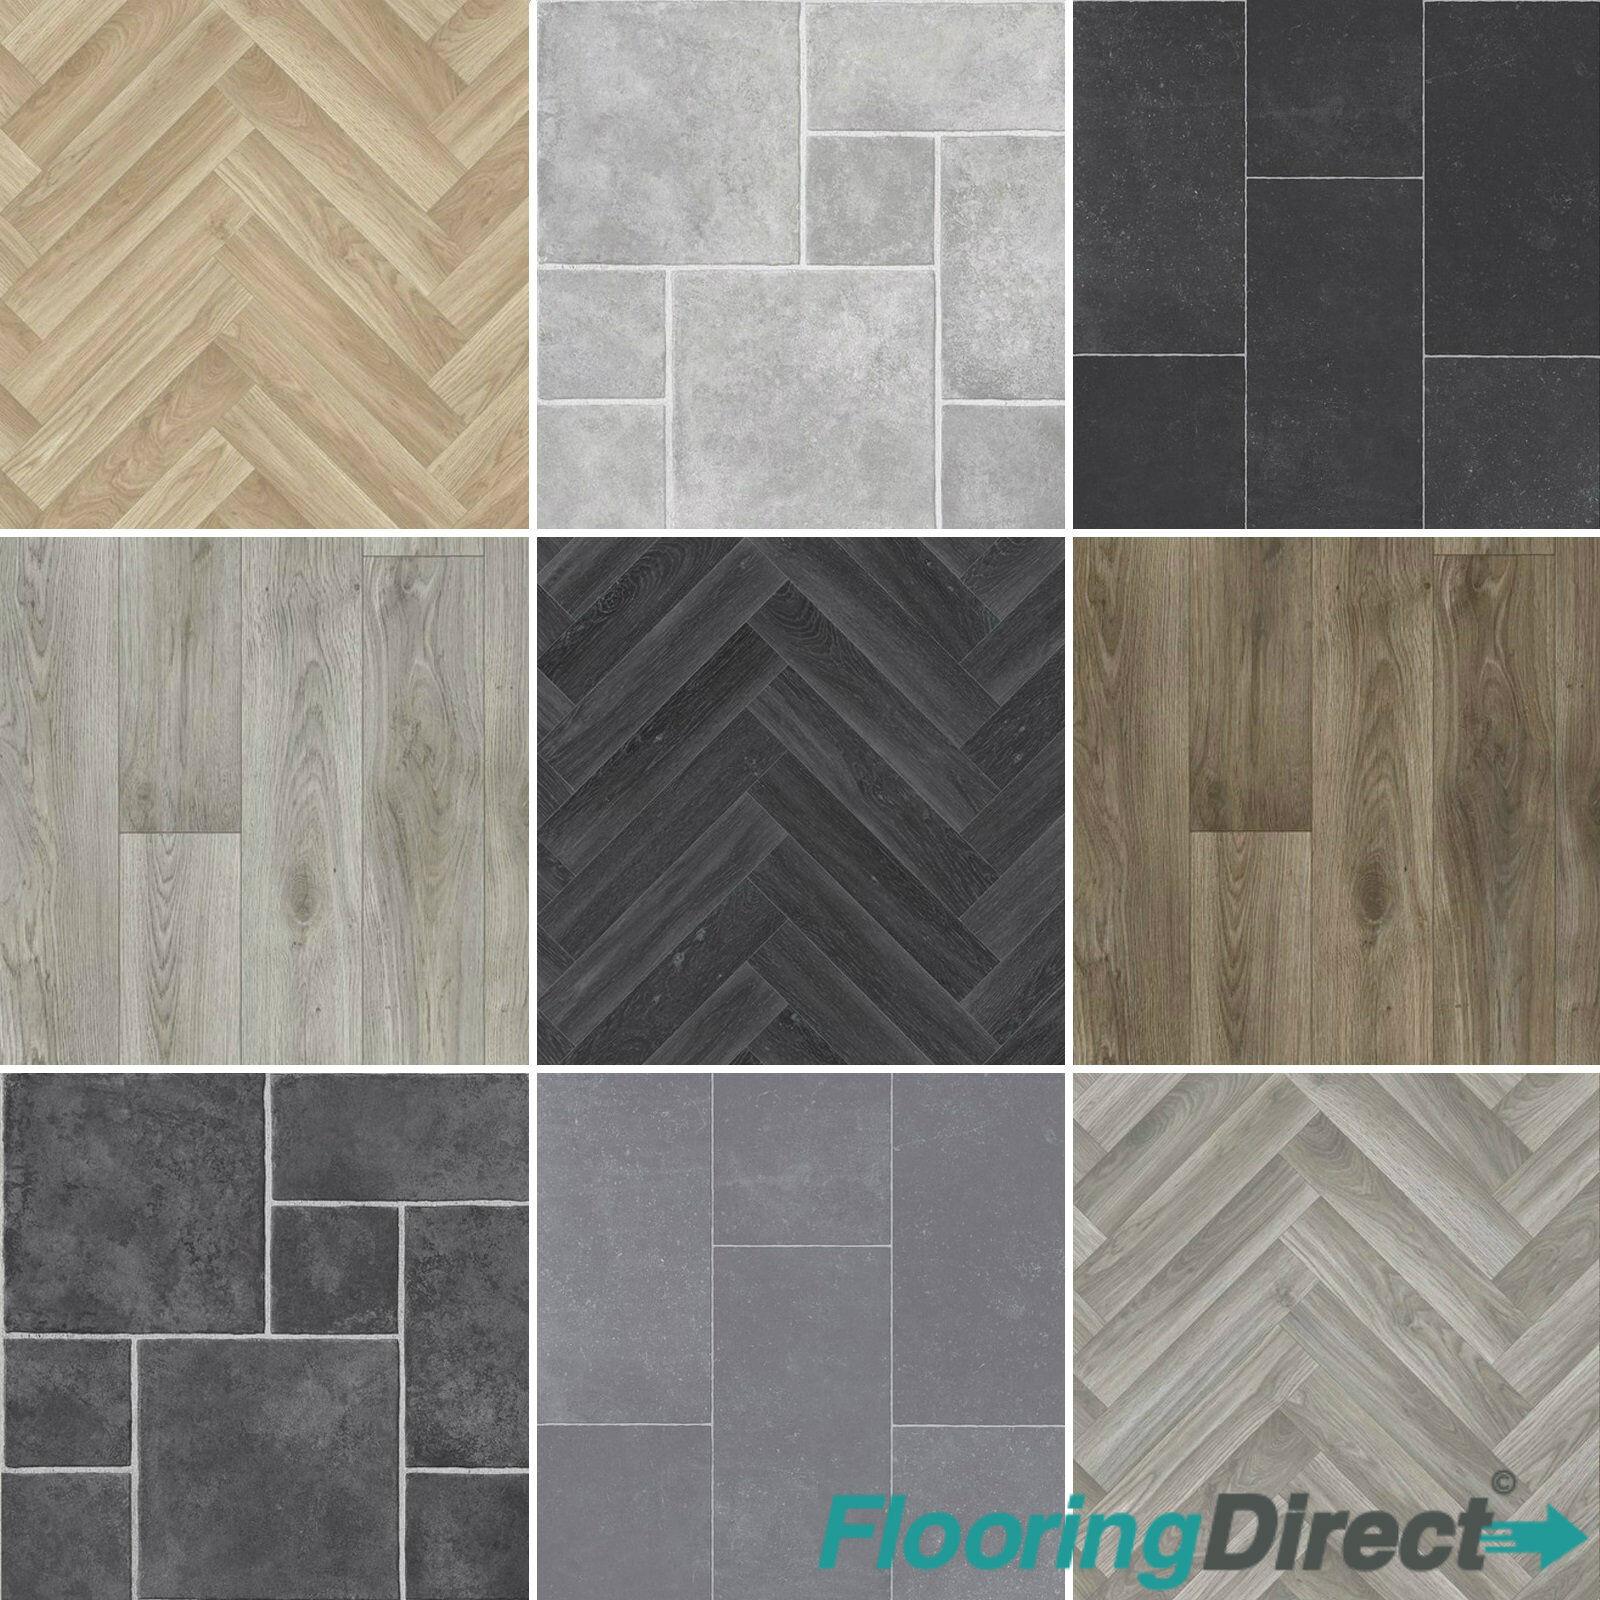 4mm thick quality vinyl flooring